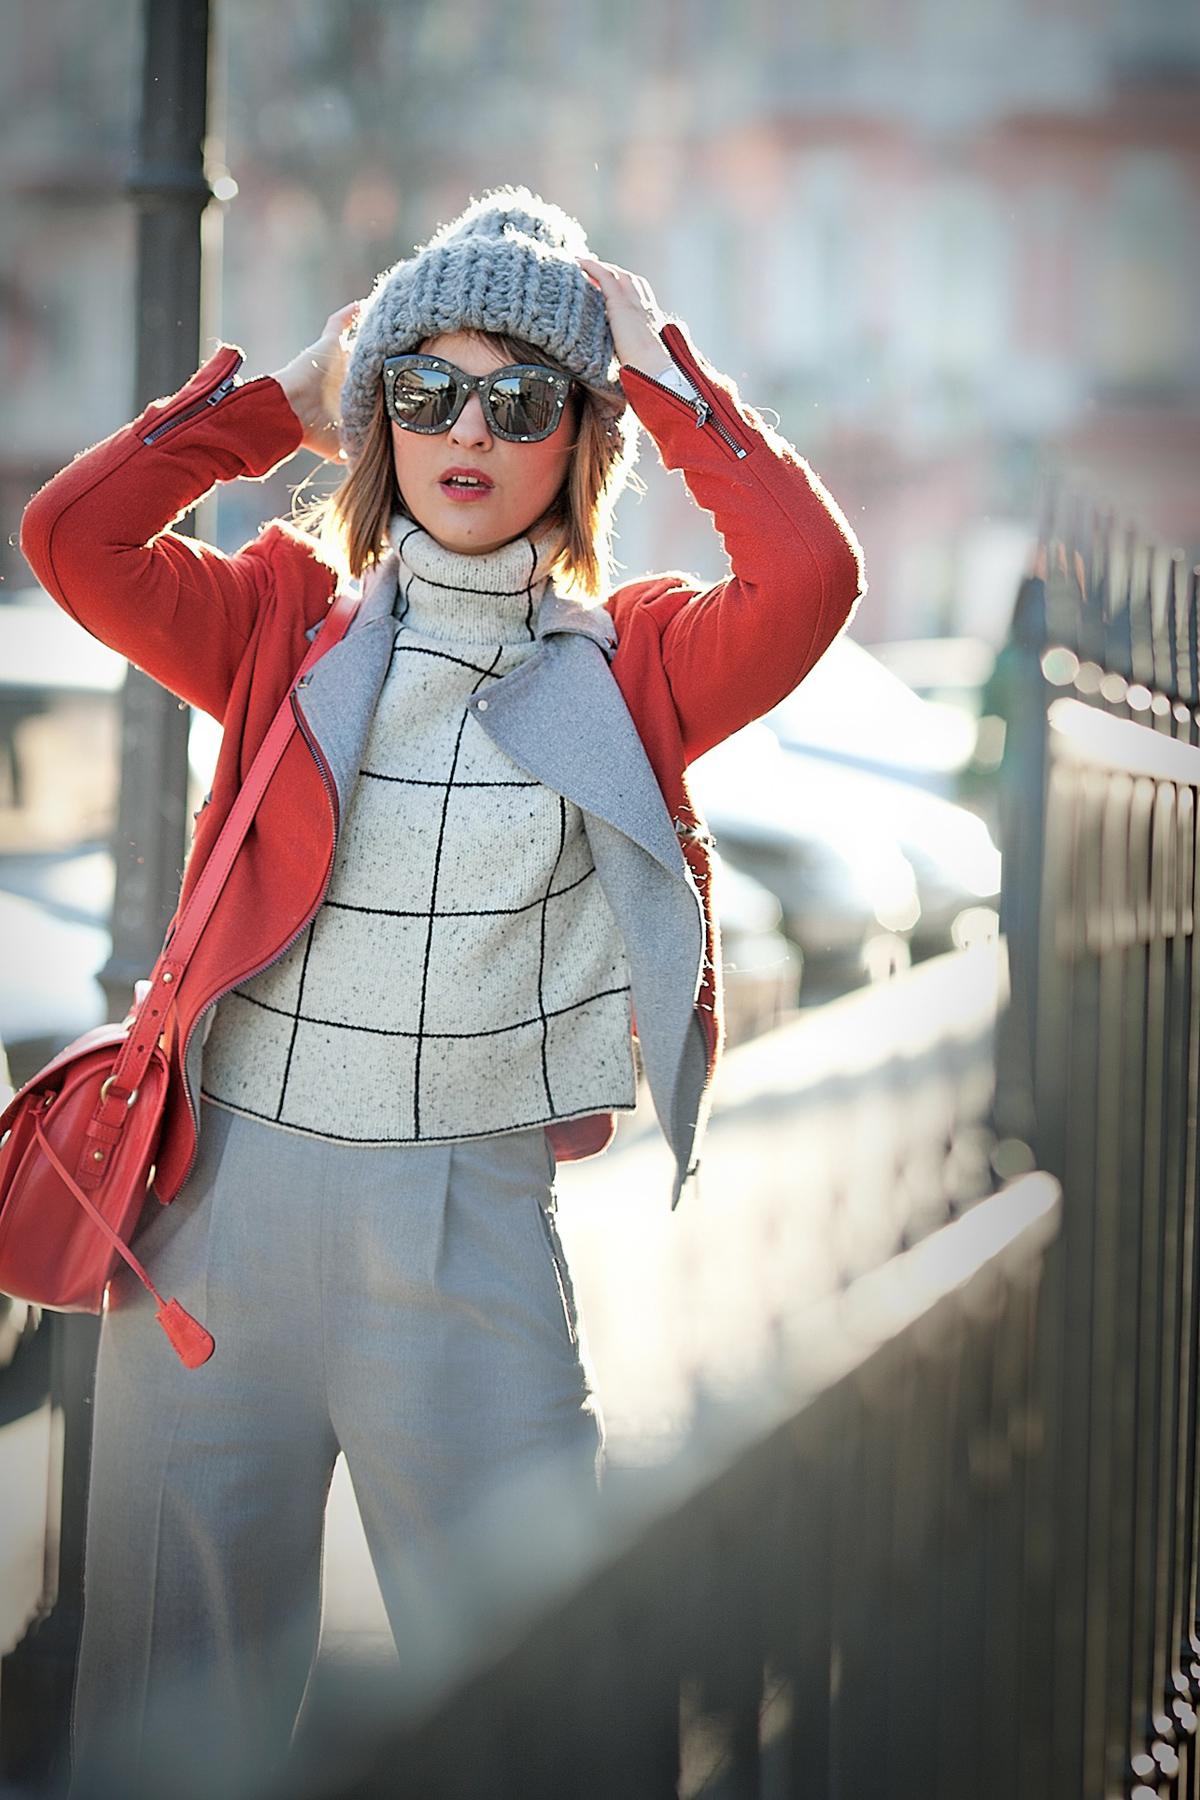 kuboraum sunglasses, galant girl, opening ceremony, whistles trousers, wool biker jacket,